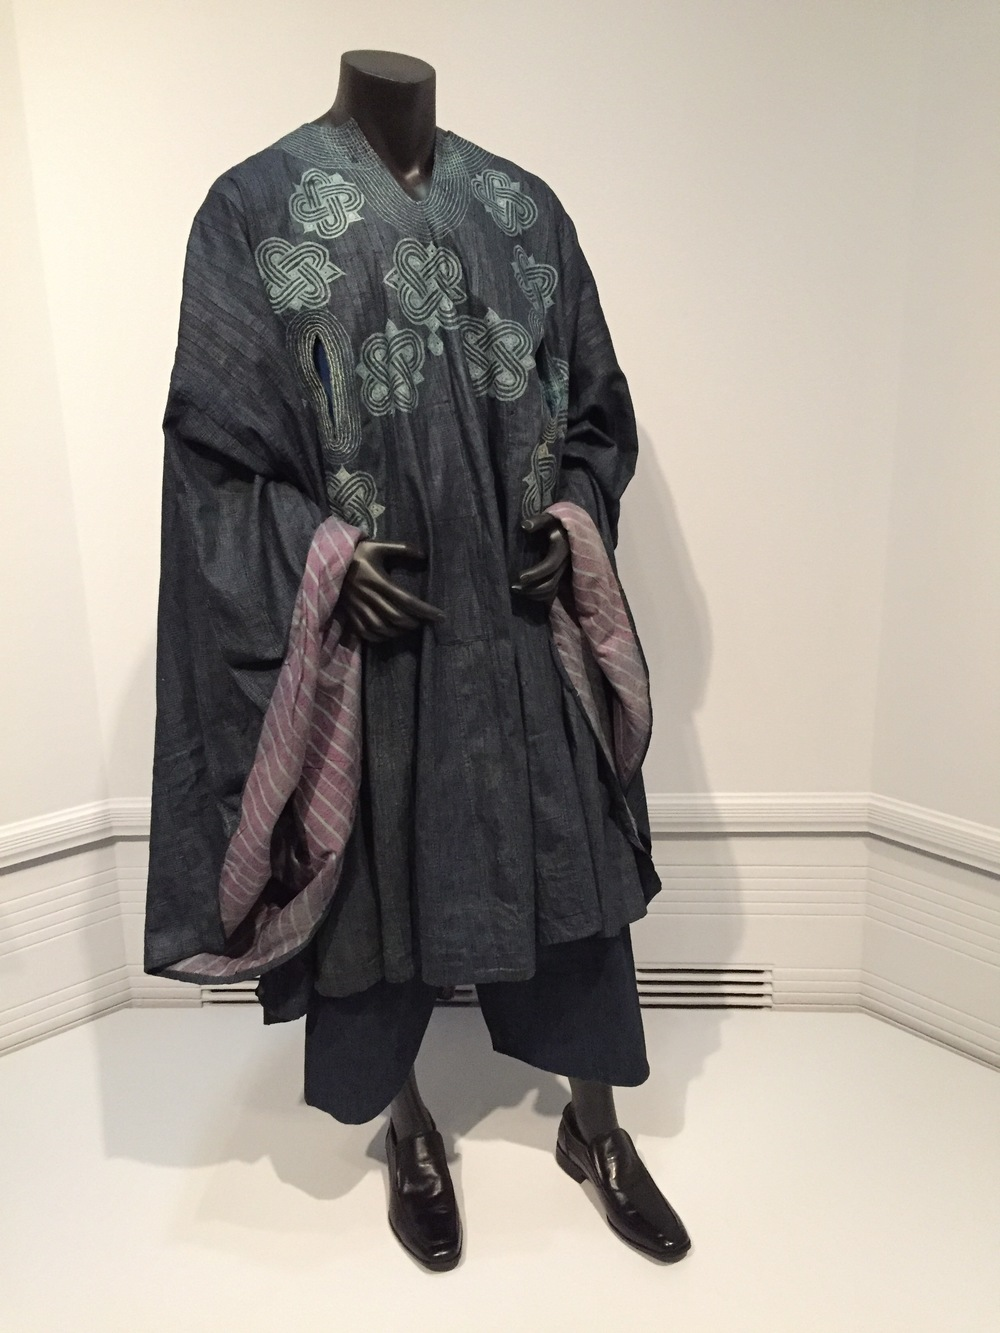 dandogo (man's tunic, Nigeria, Yoruba, Ekiti)